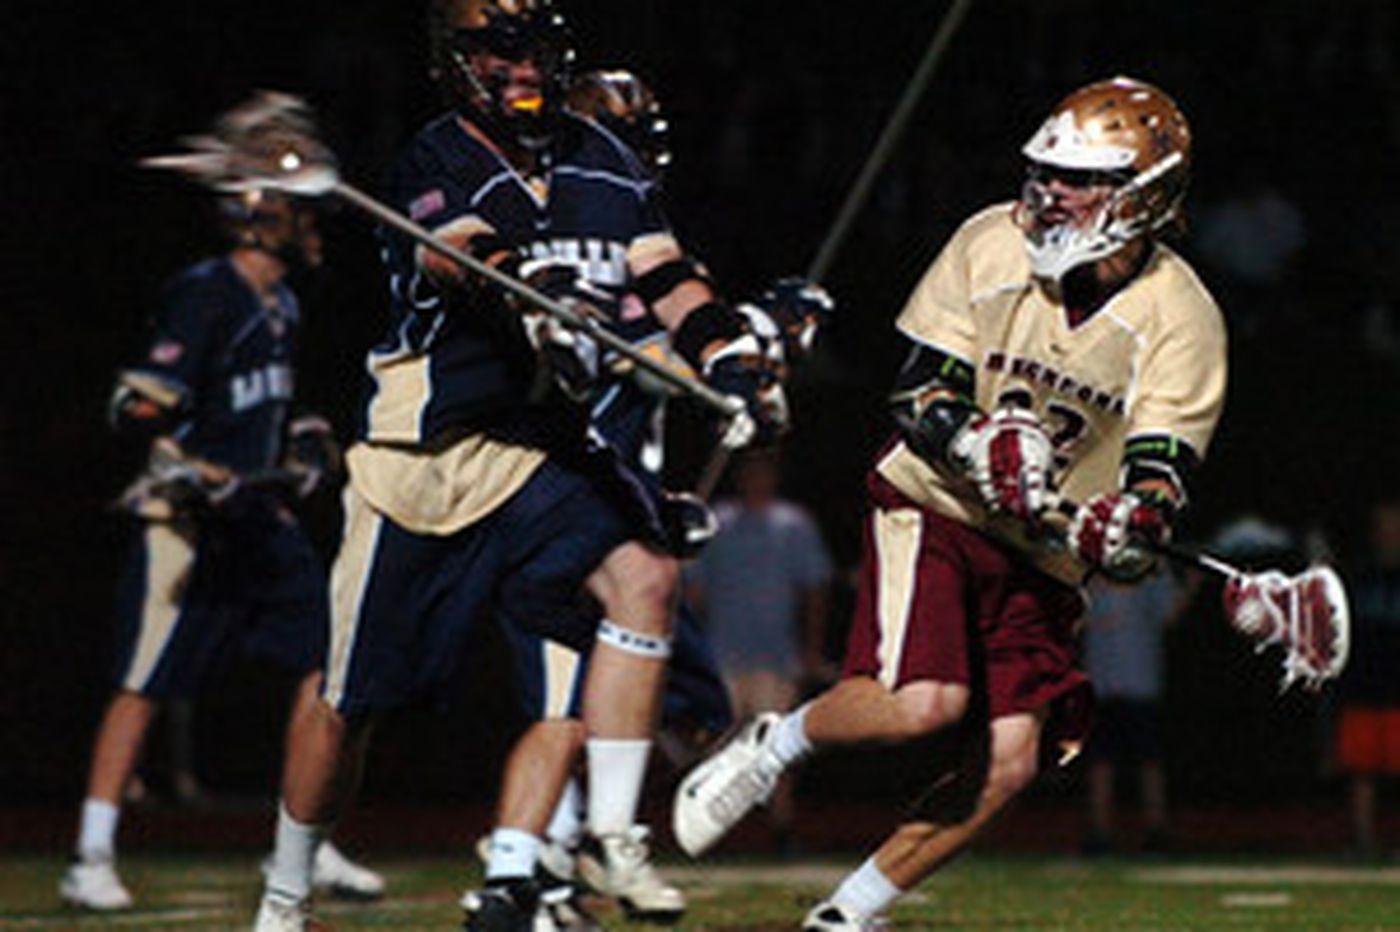 Malvern Prep, La Salle advance to lacrosse showdown